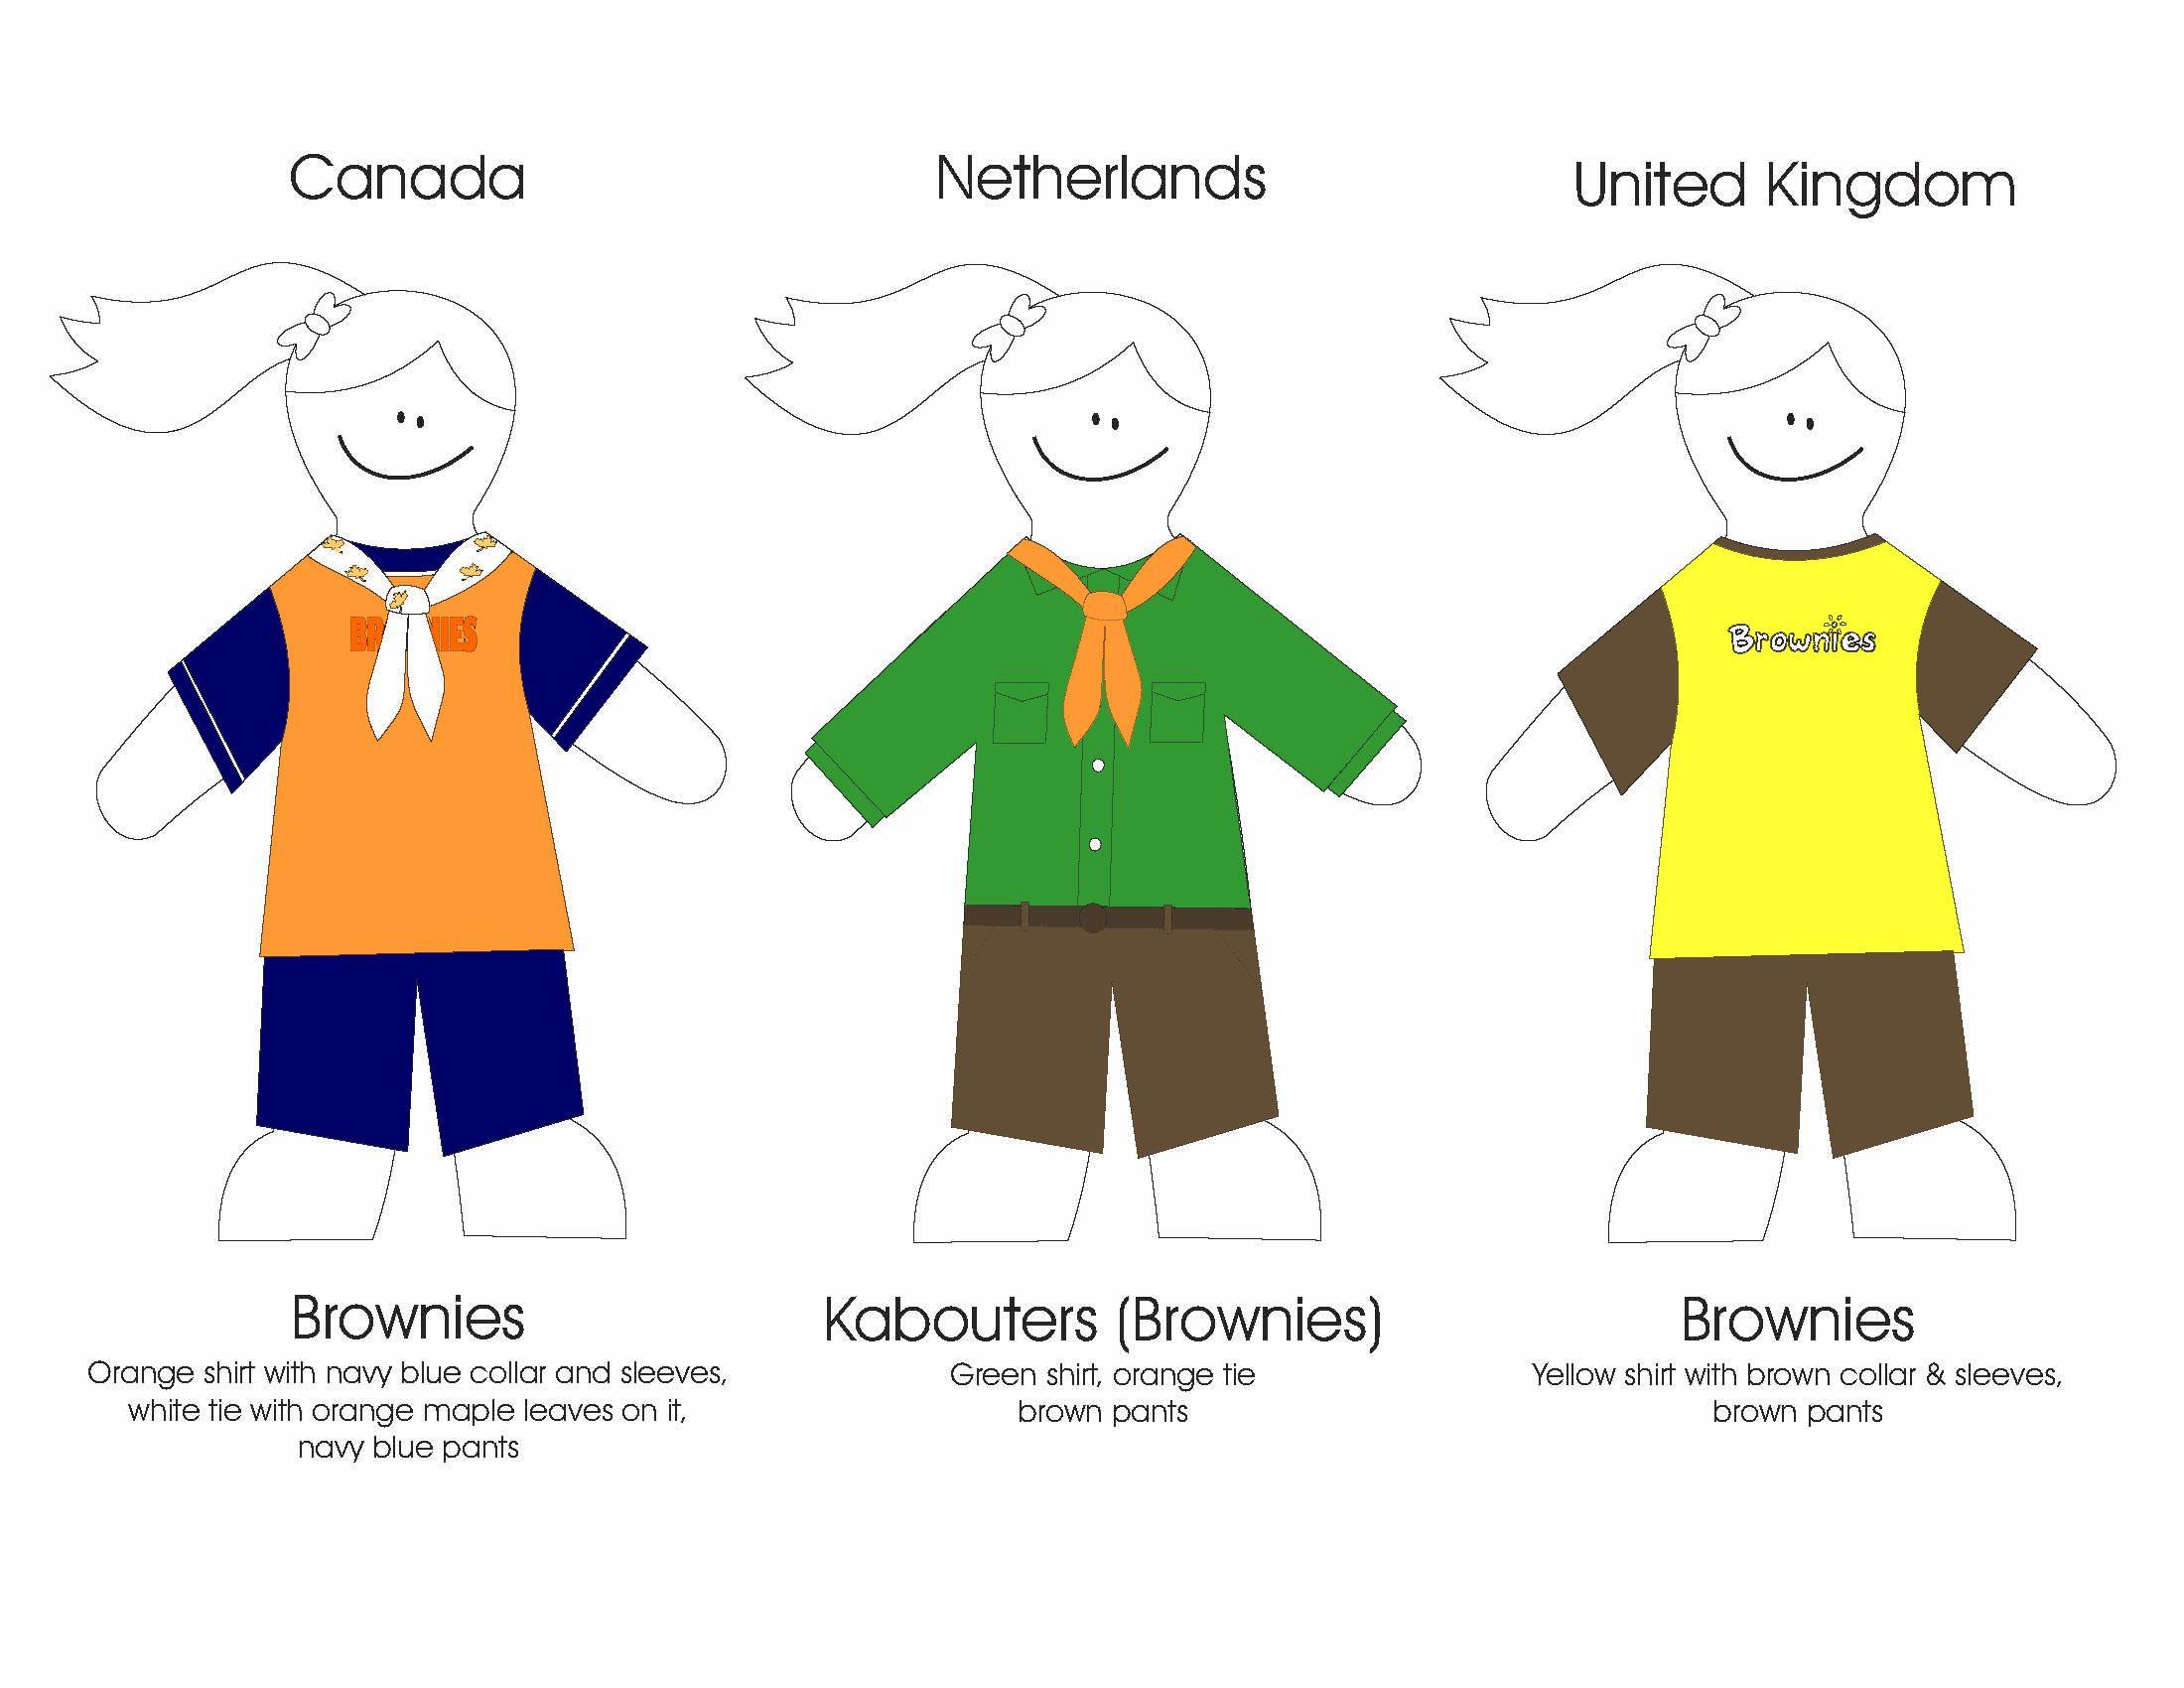 Brownies Around The World Uniforms